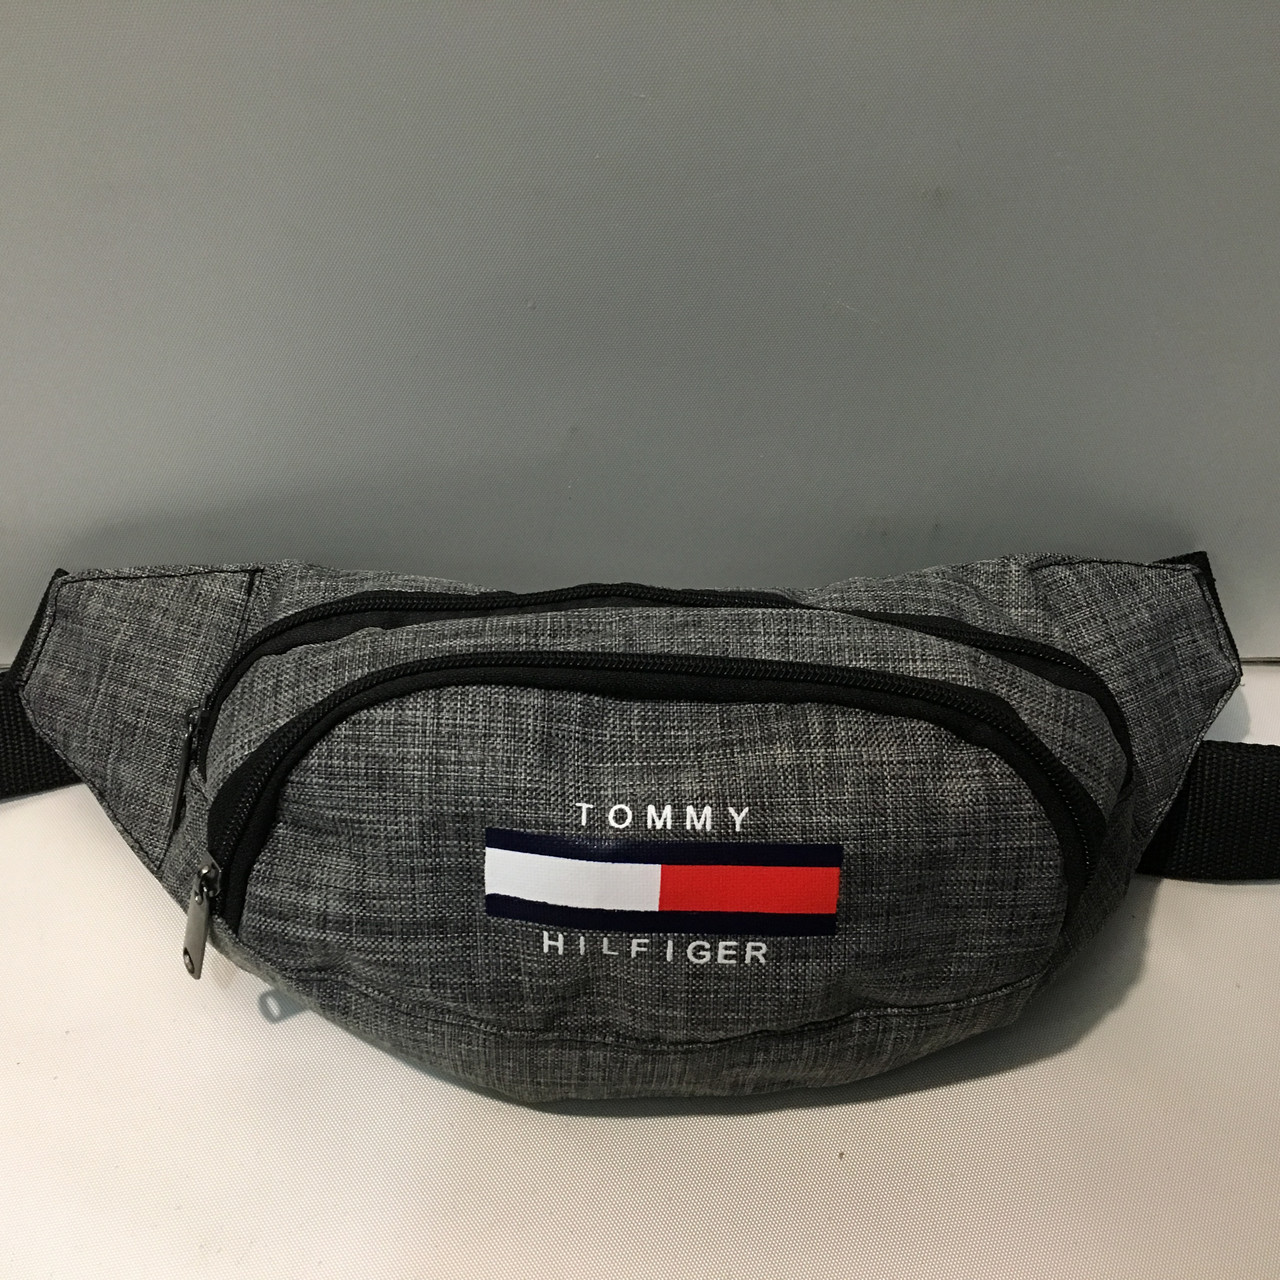 e6378ad10b76 Модная поясная сумка,бананка Tommy Hilfiger оптом: продажа, цена в ...